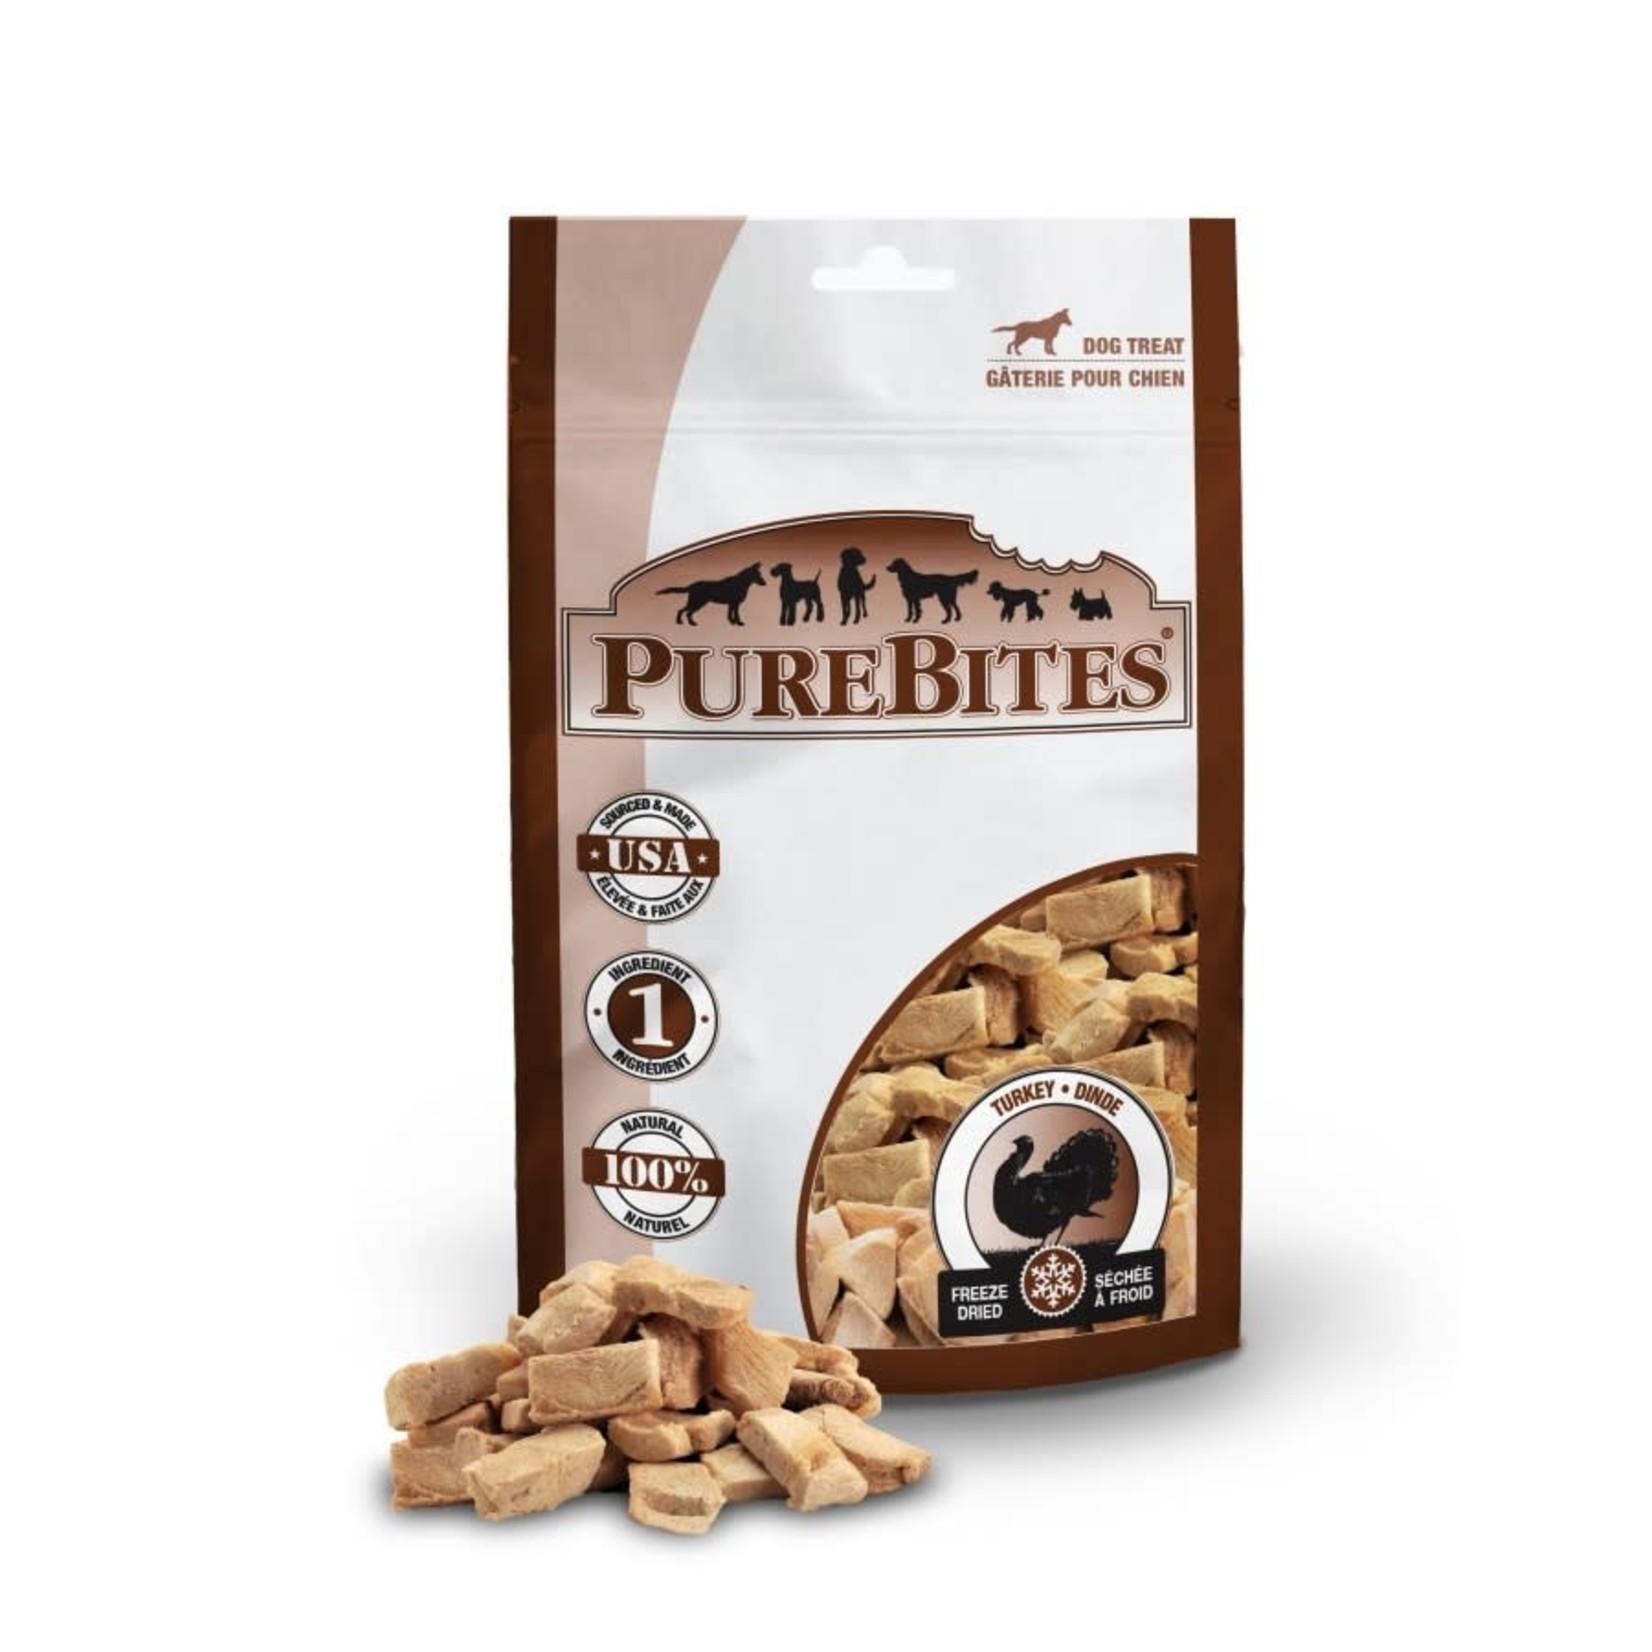 Pure Bites PureBites Turkey Mid 74g